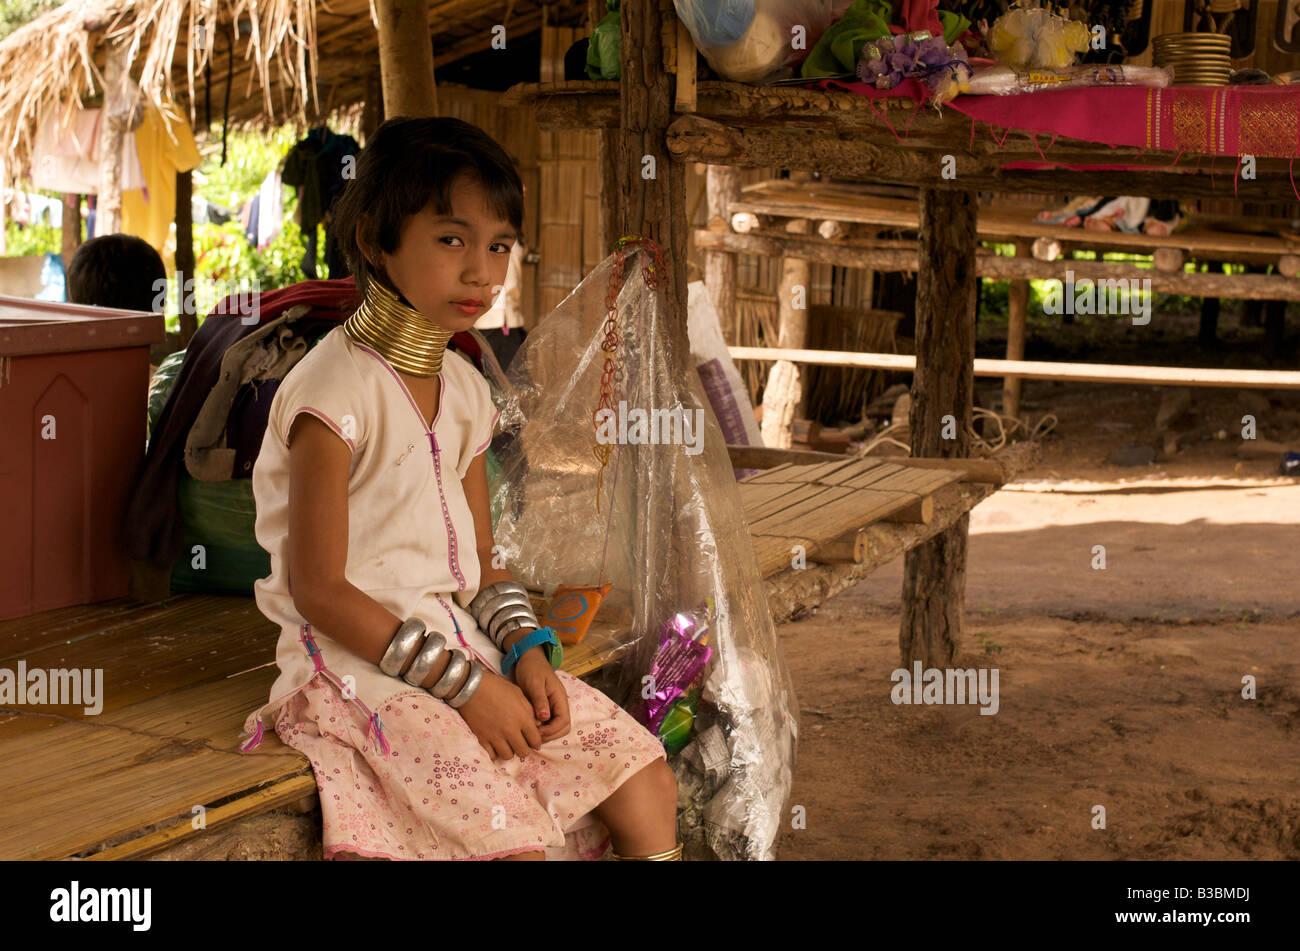 Bp necked girl photo